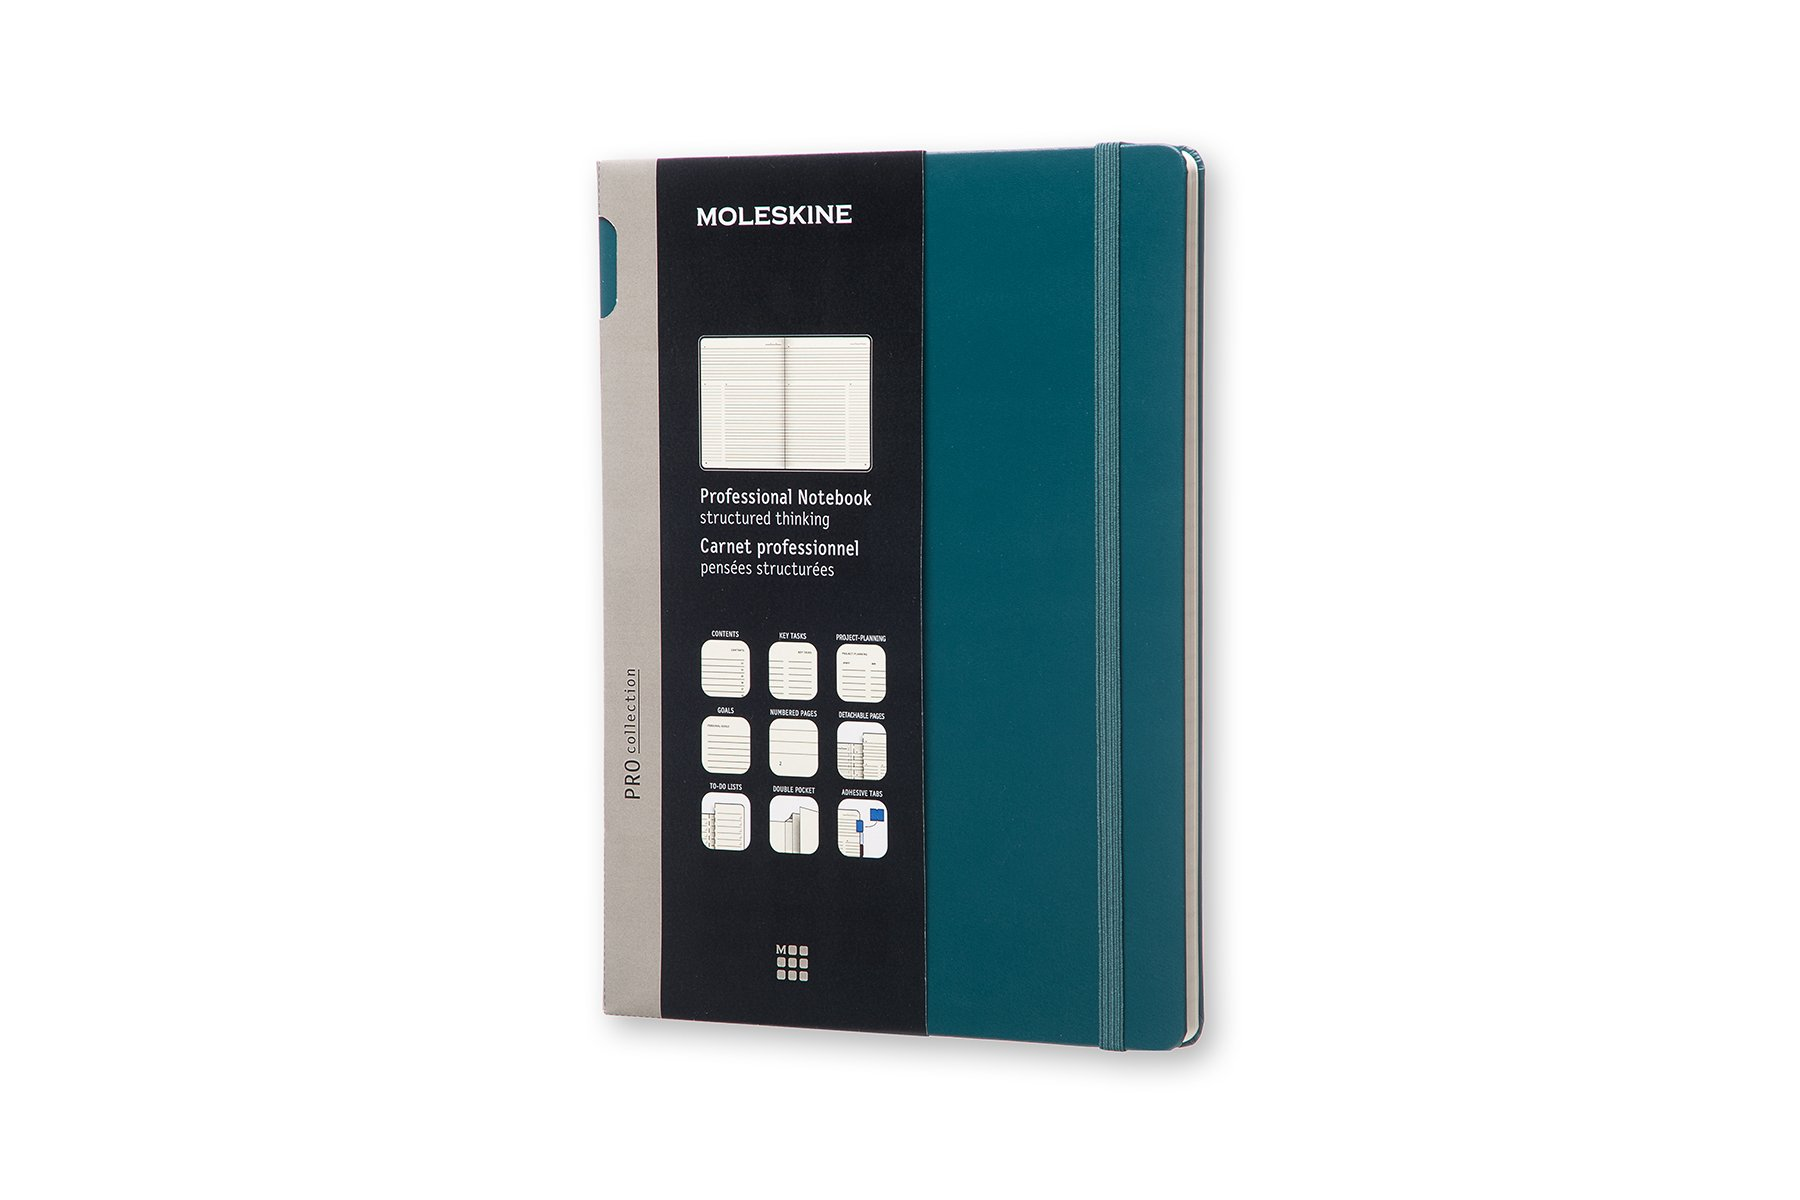 Moleskine Pro Hard Cover Notebook, Professional, XL (7.5 x..